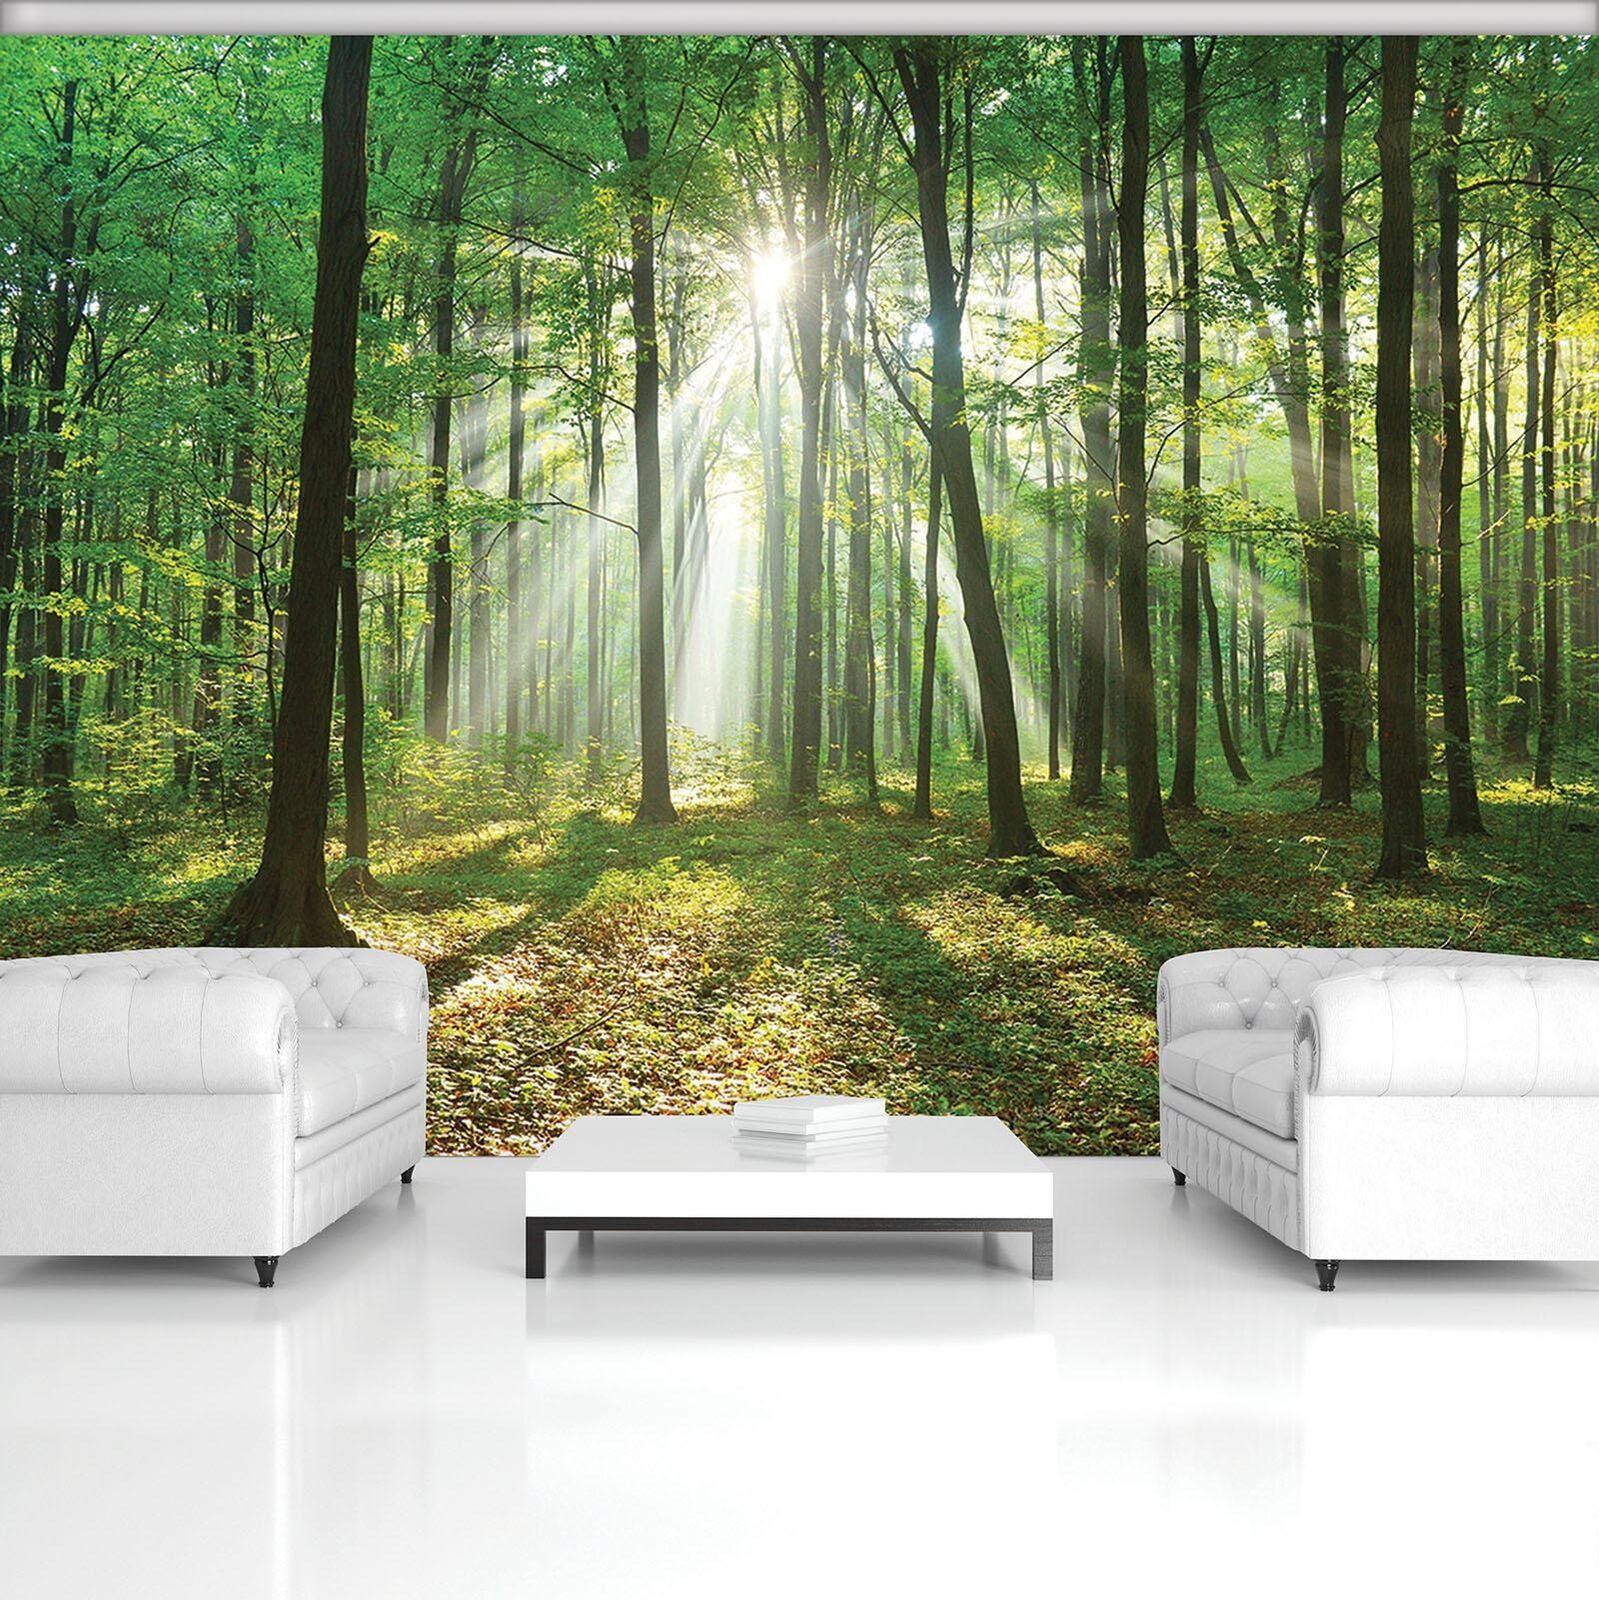 Vließ Fototapete Tapete Wandbild Wald Baum Sonne 310329_VEMVT